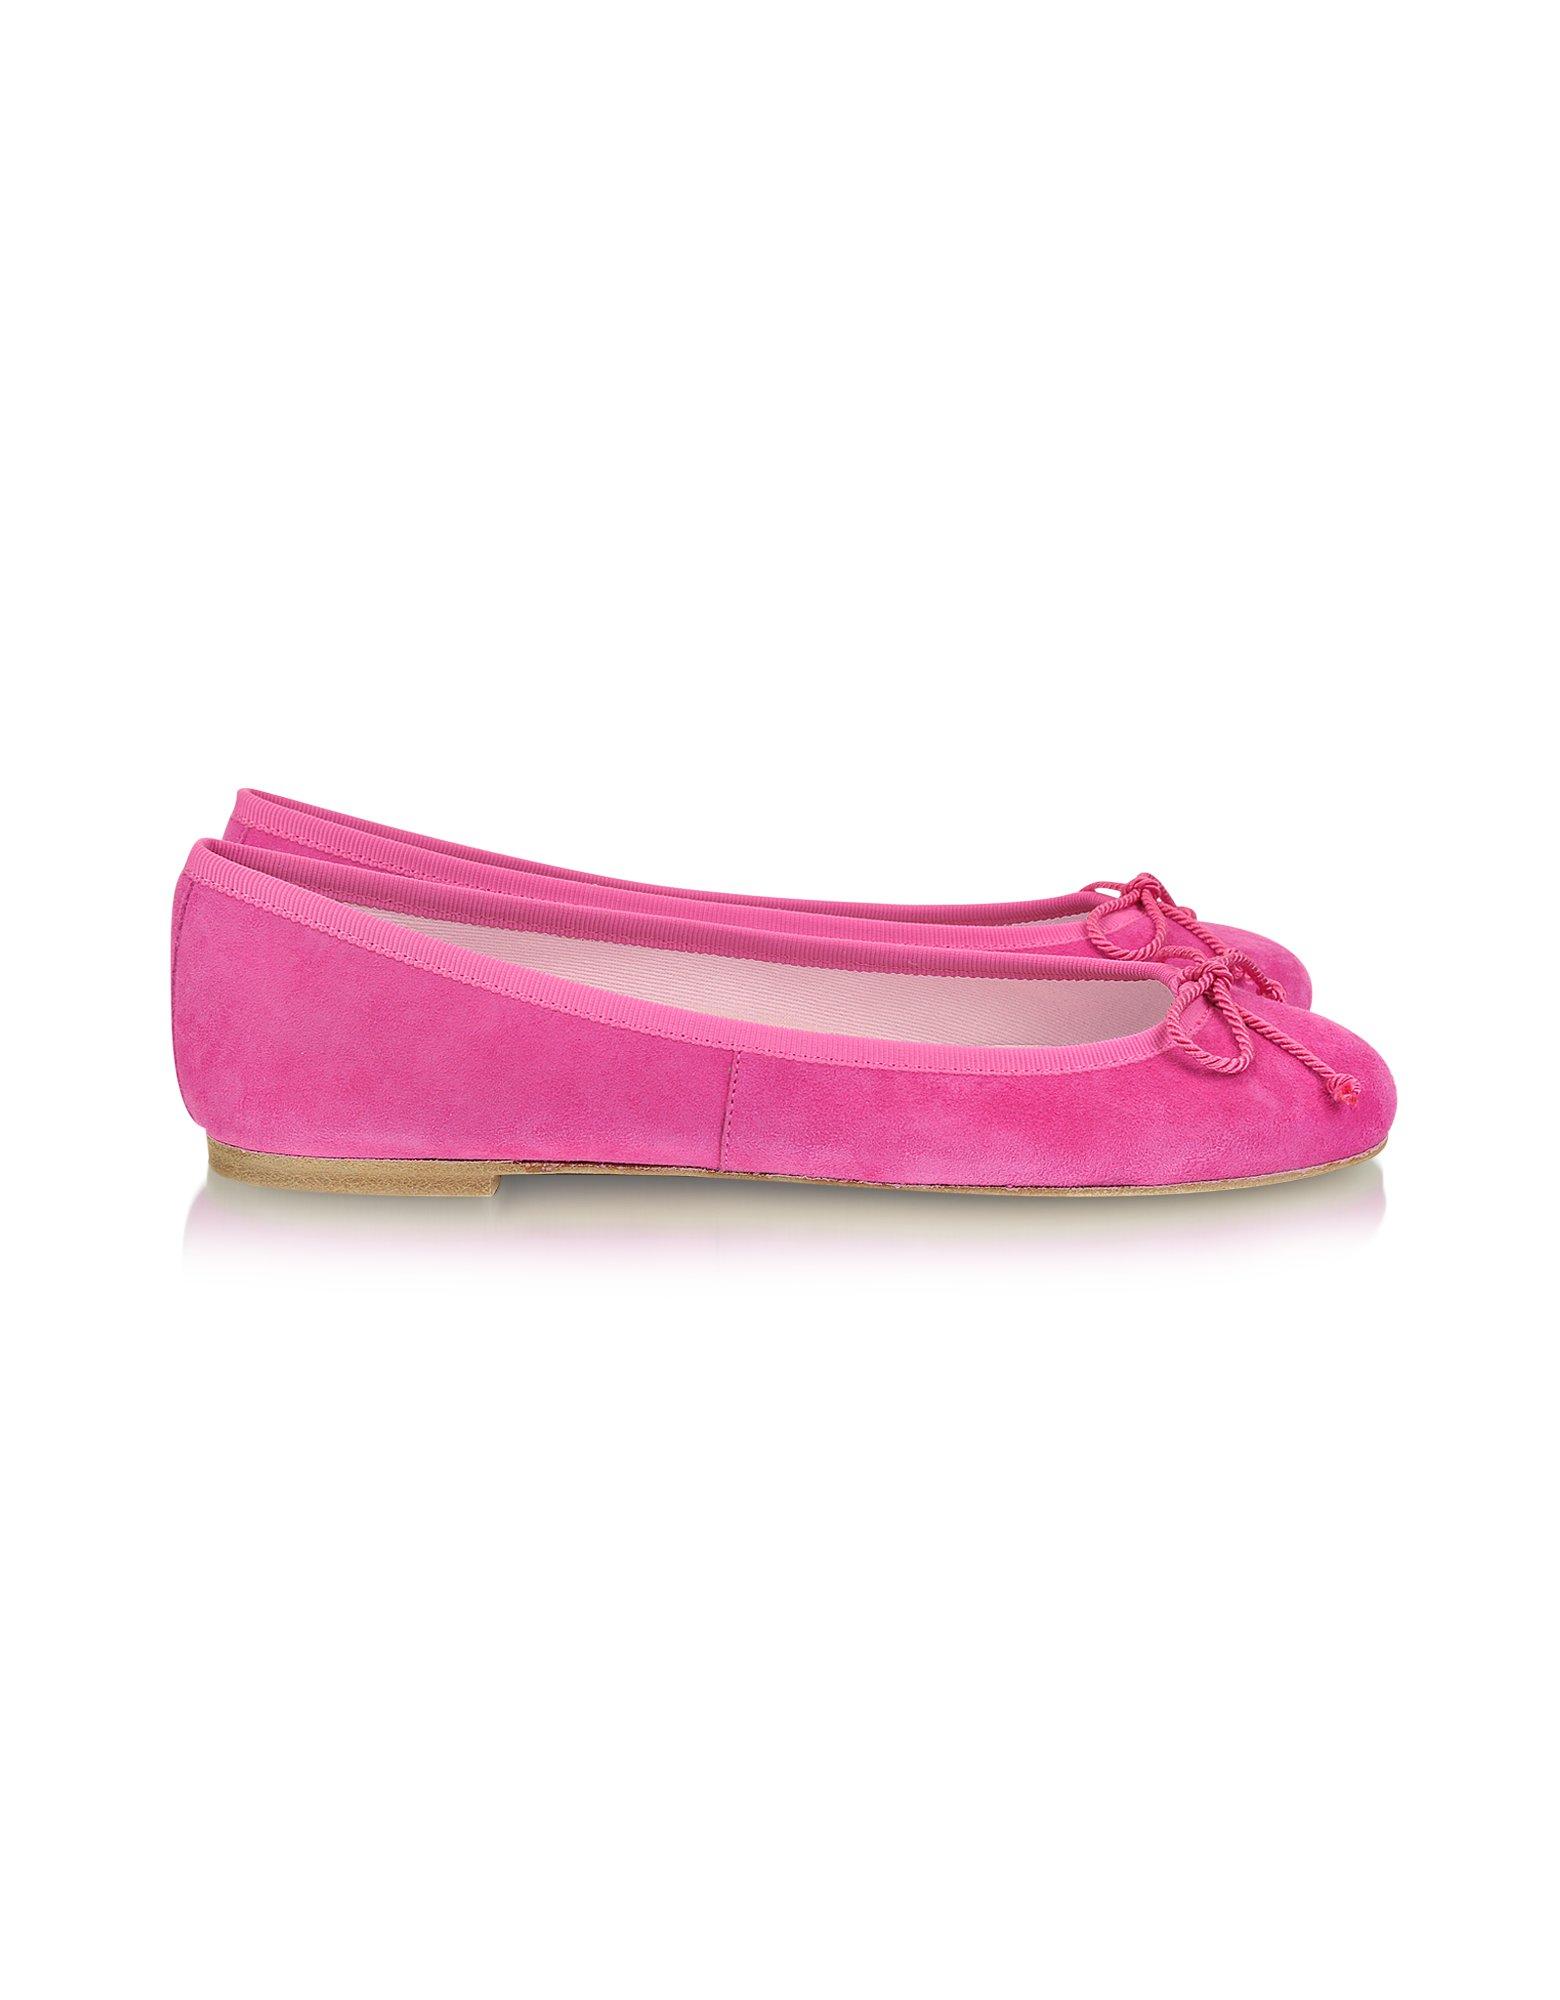 Fuchsia Shoes Flats